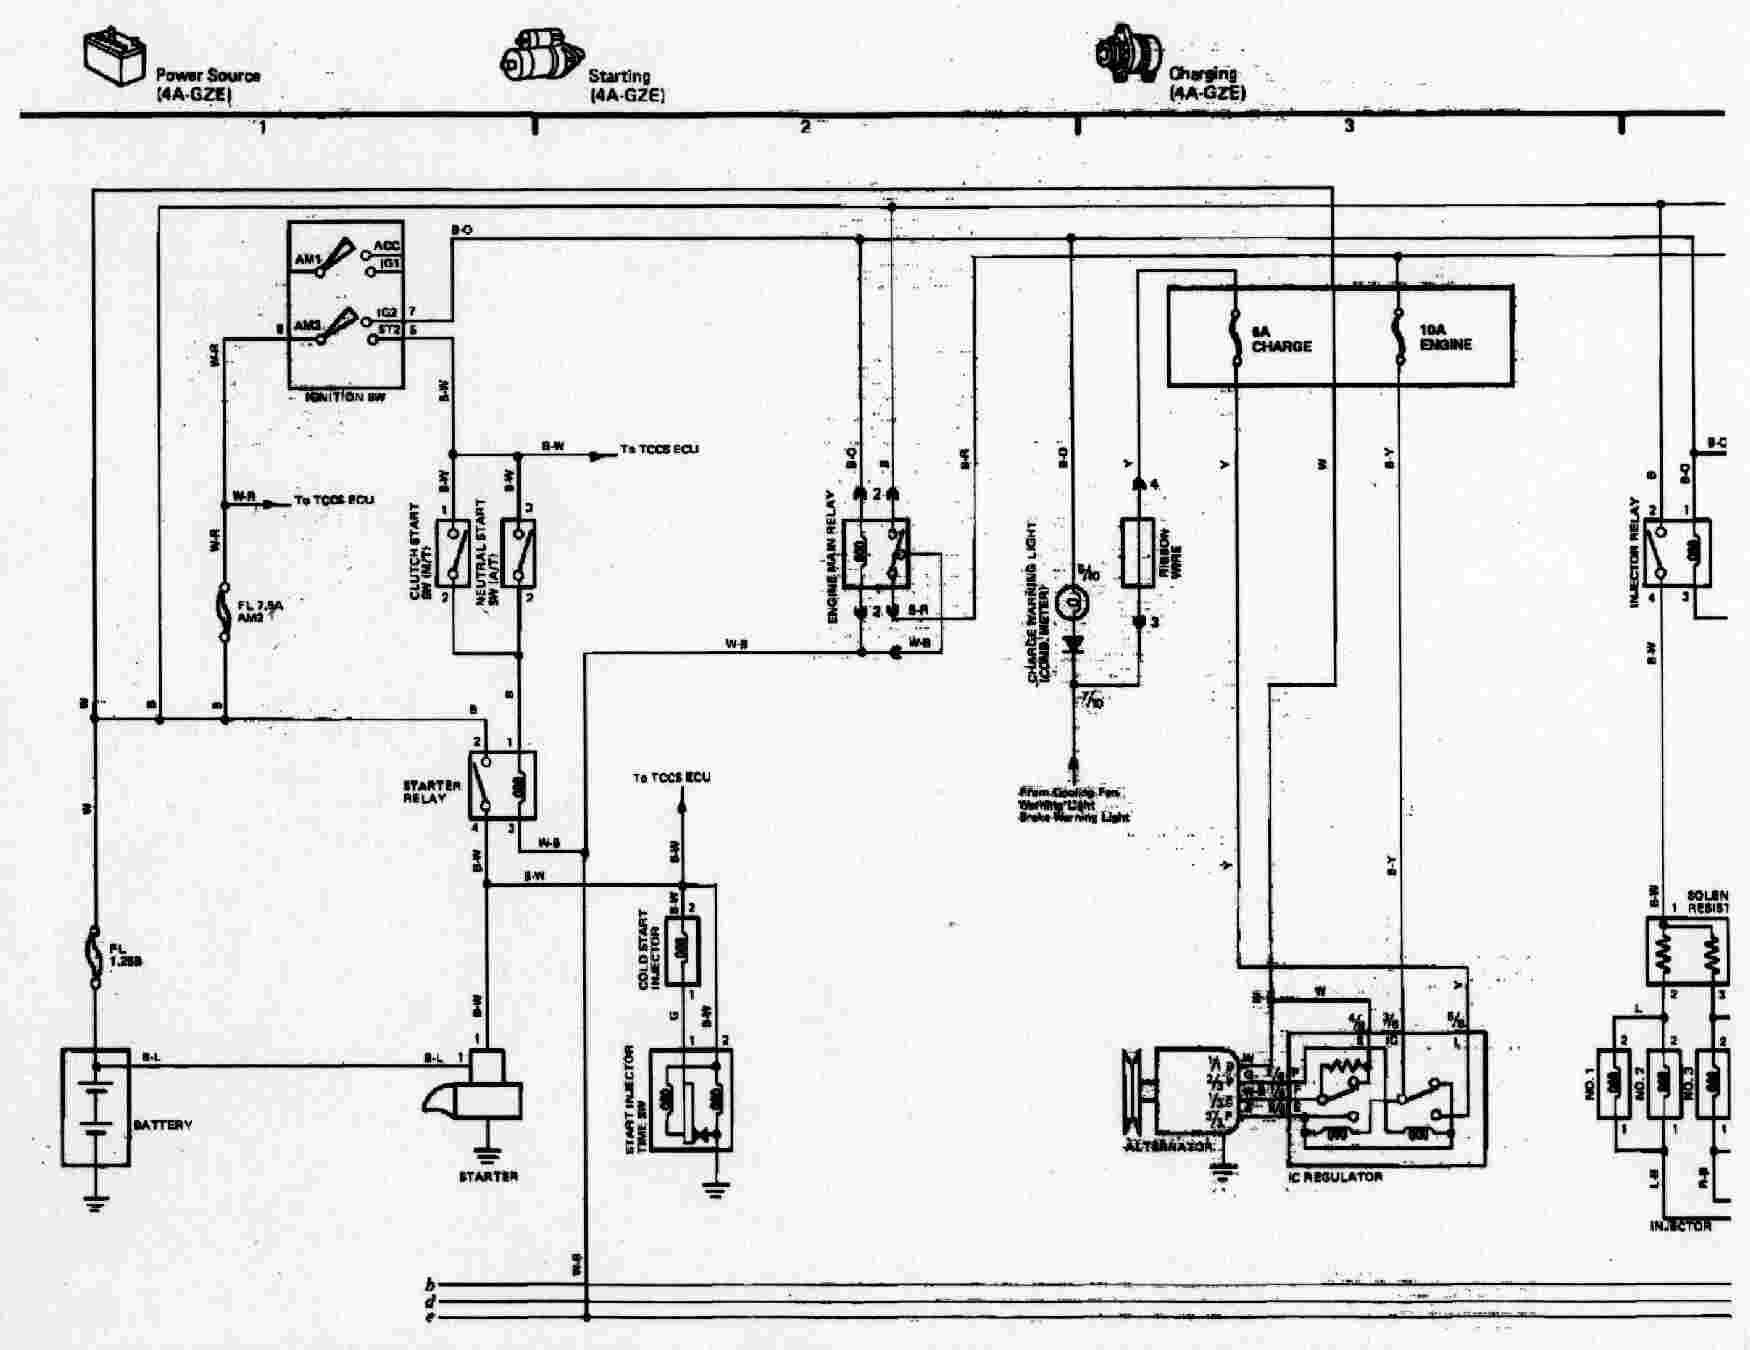 mk1 mr2 fuse diagram wiring diagram paper  1986 toyota mr2 fuse box numbers wiring diagram new mk1 mr2 fuse diagram